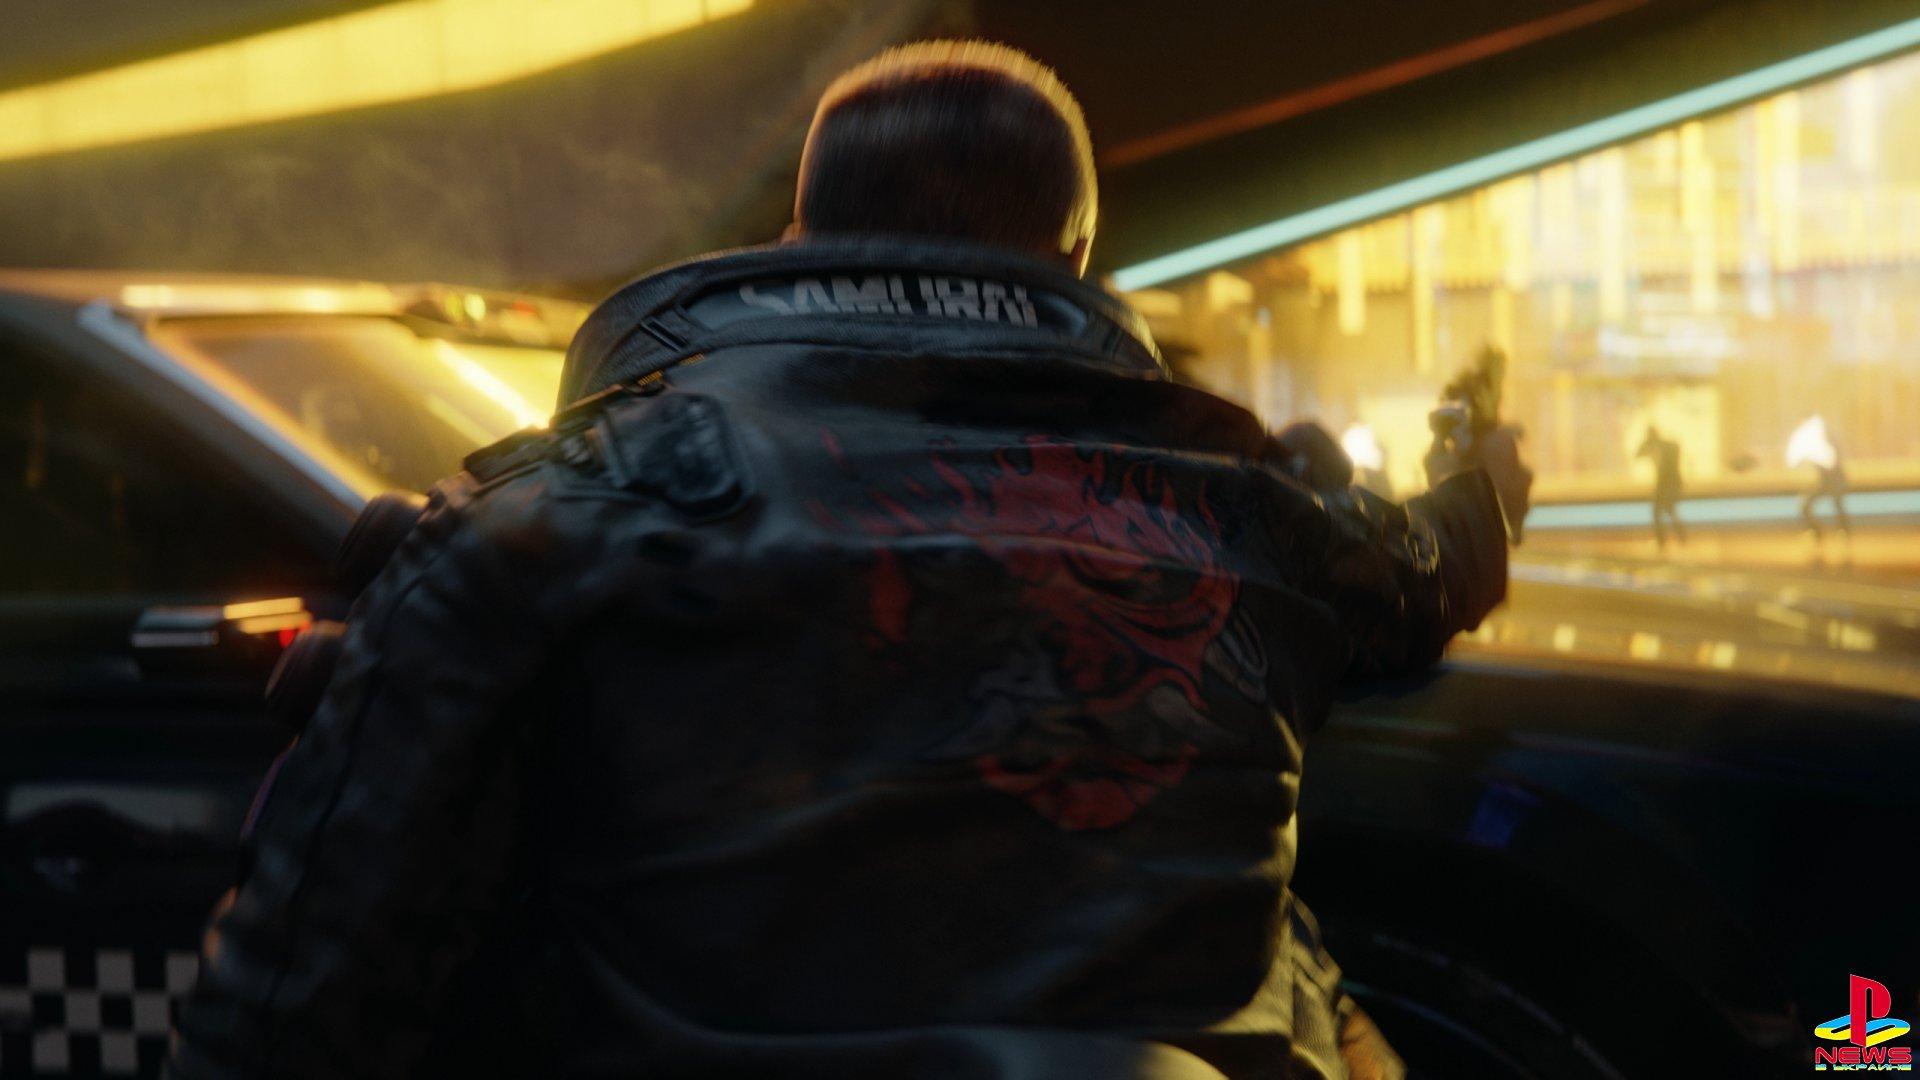 Cyberpunk 2077 получит несколько DLC в стиле The Witcher 3